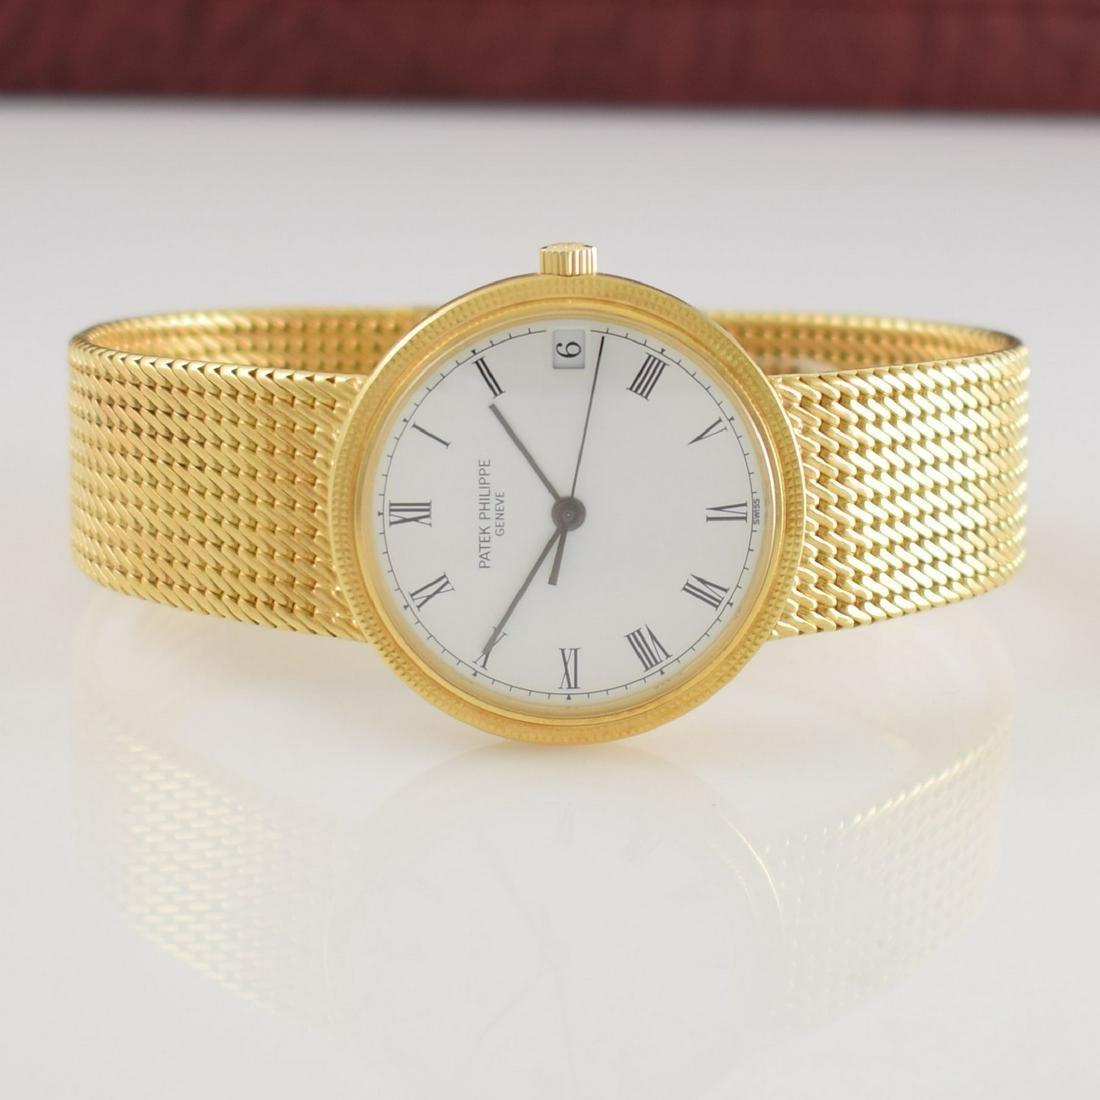 PATEK PHILIPPE gents gold wristwatch Calatrava